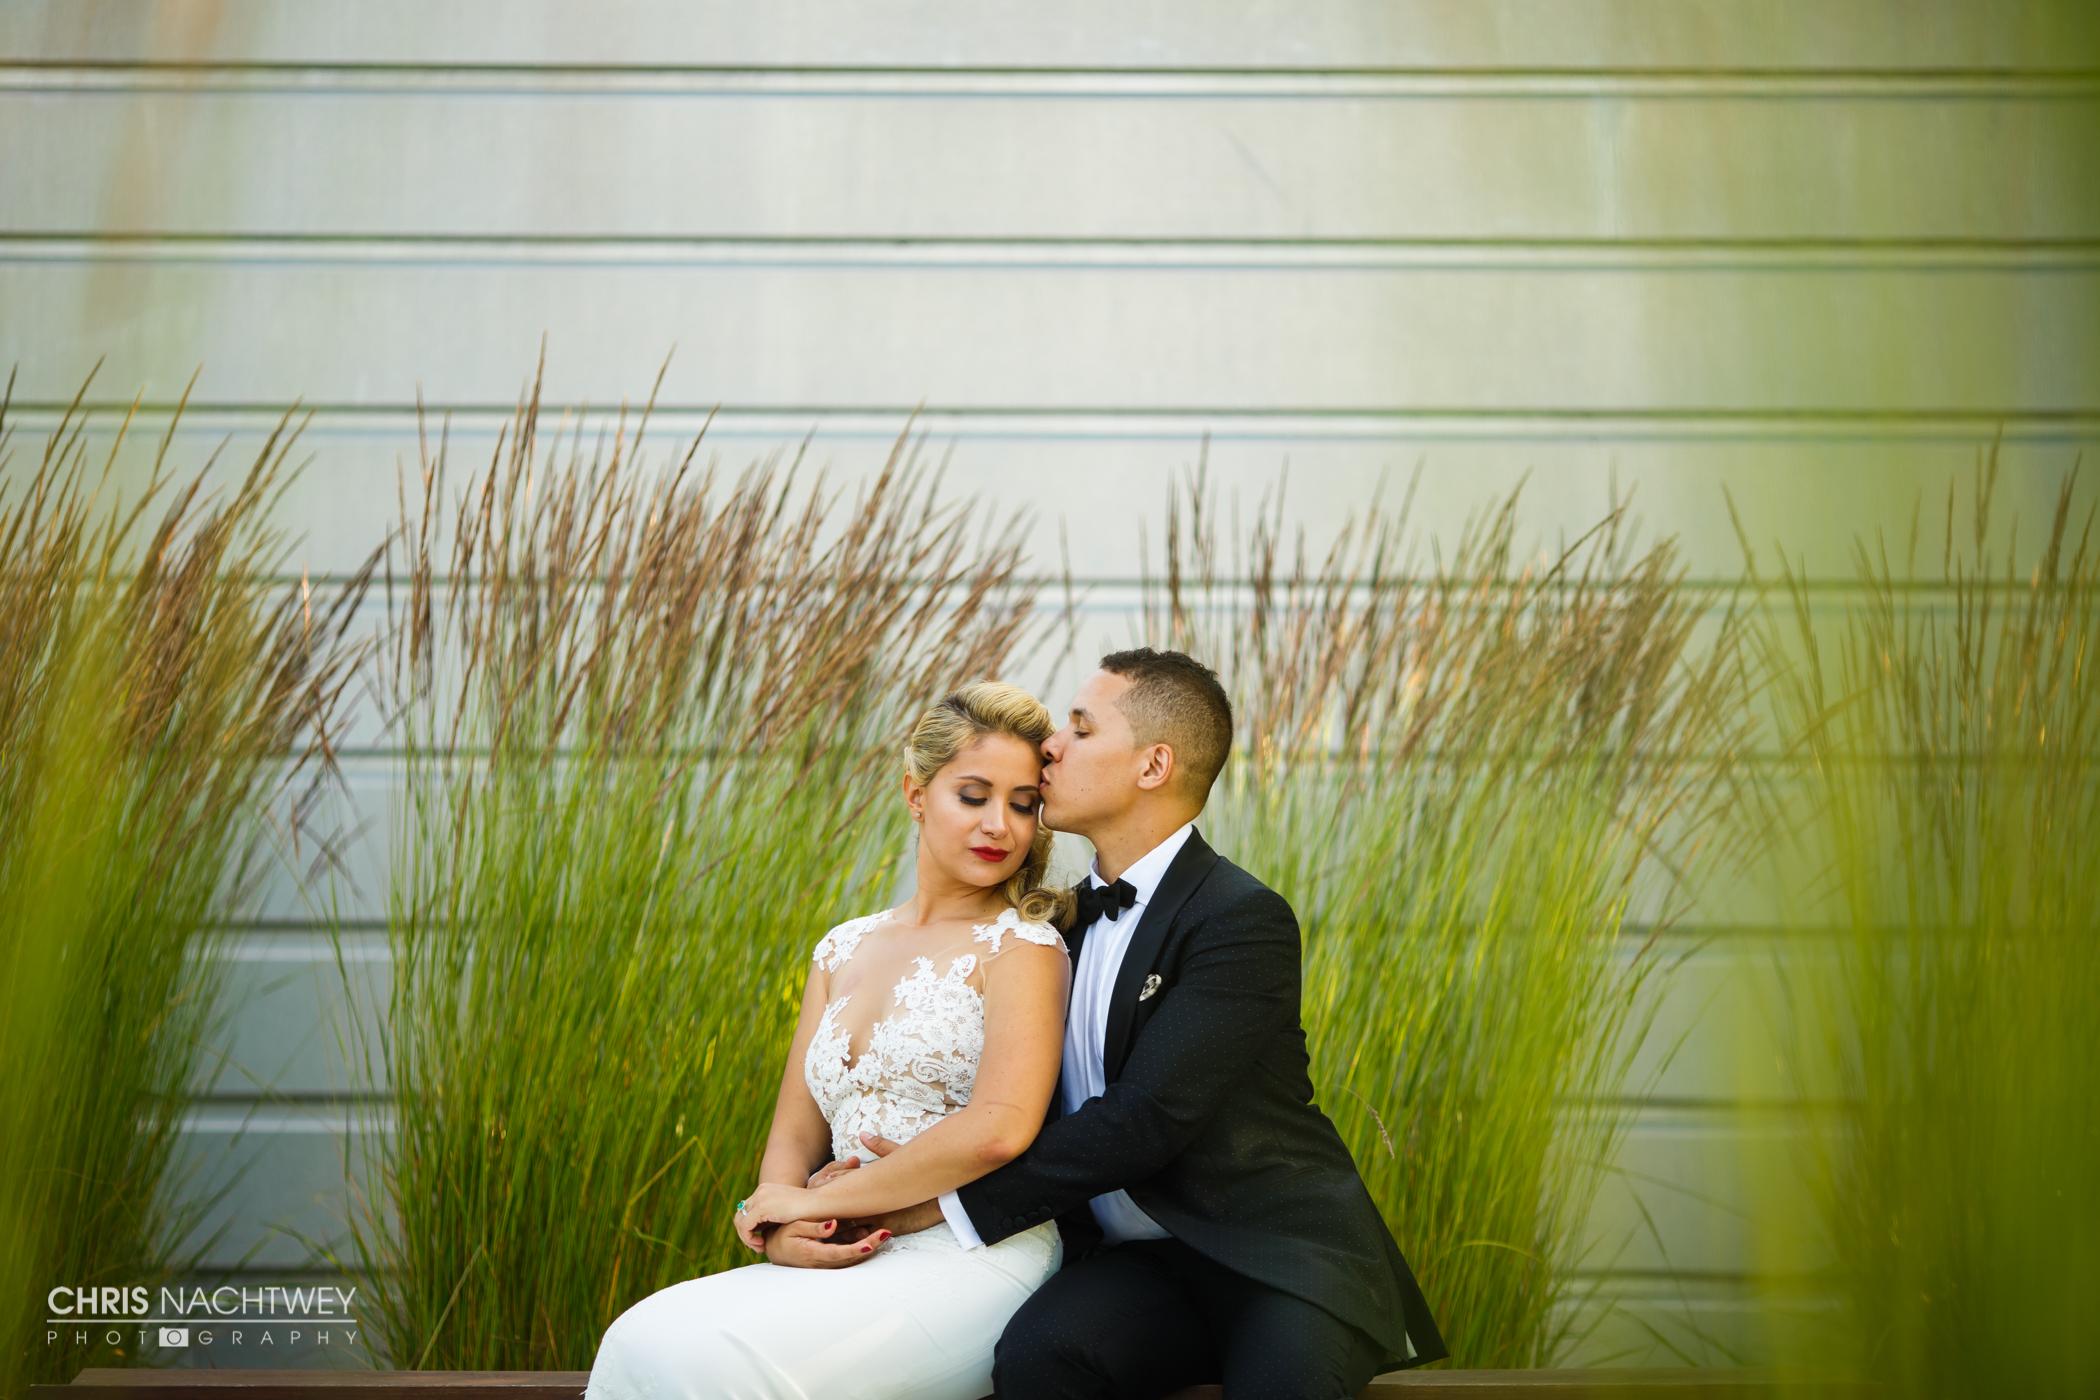 wedding-saltwater-farm-vineyard-photos-stonington-ct-chris-nachtwey-photography-2016-ana-austin-27.jpg